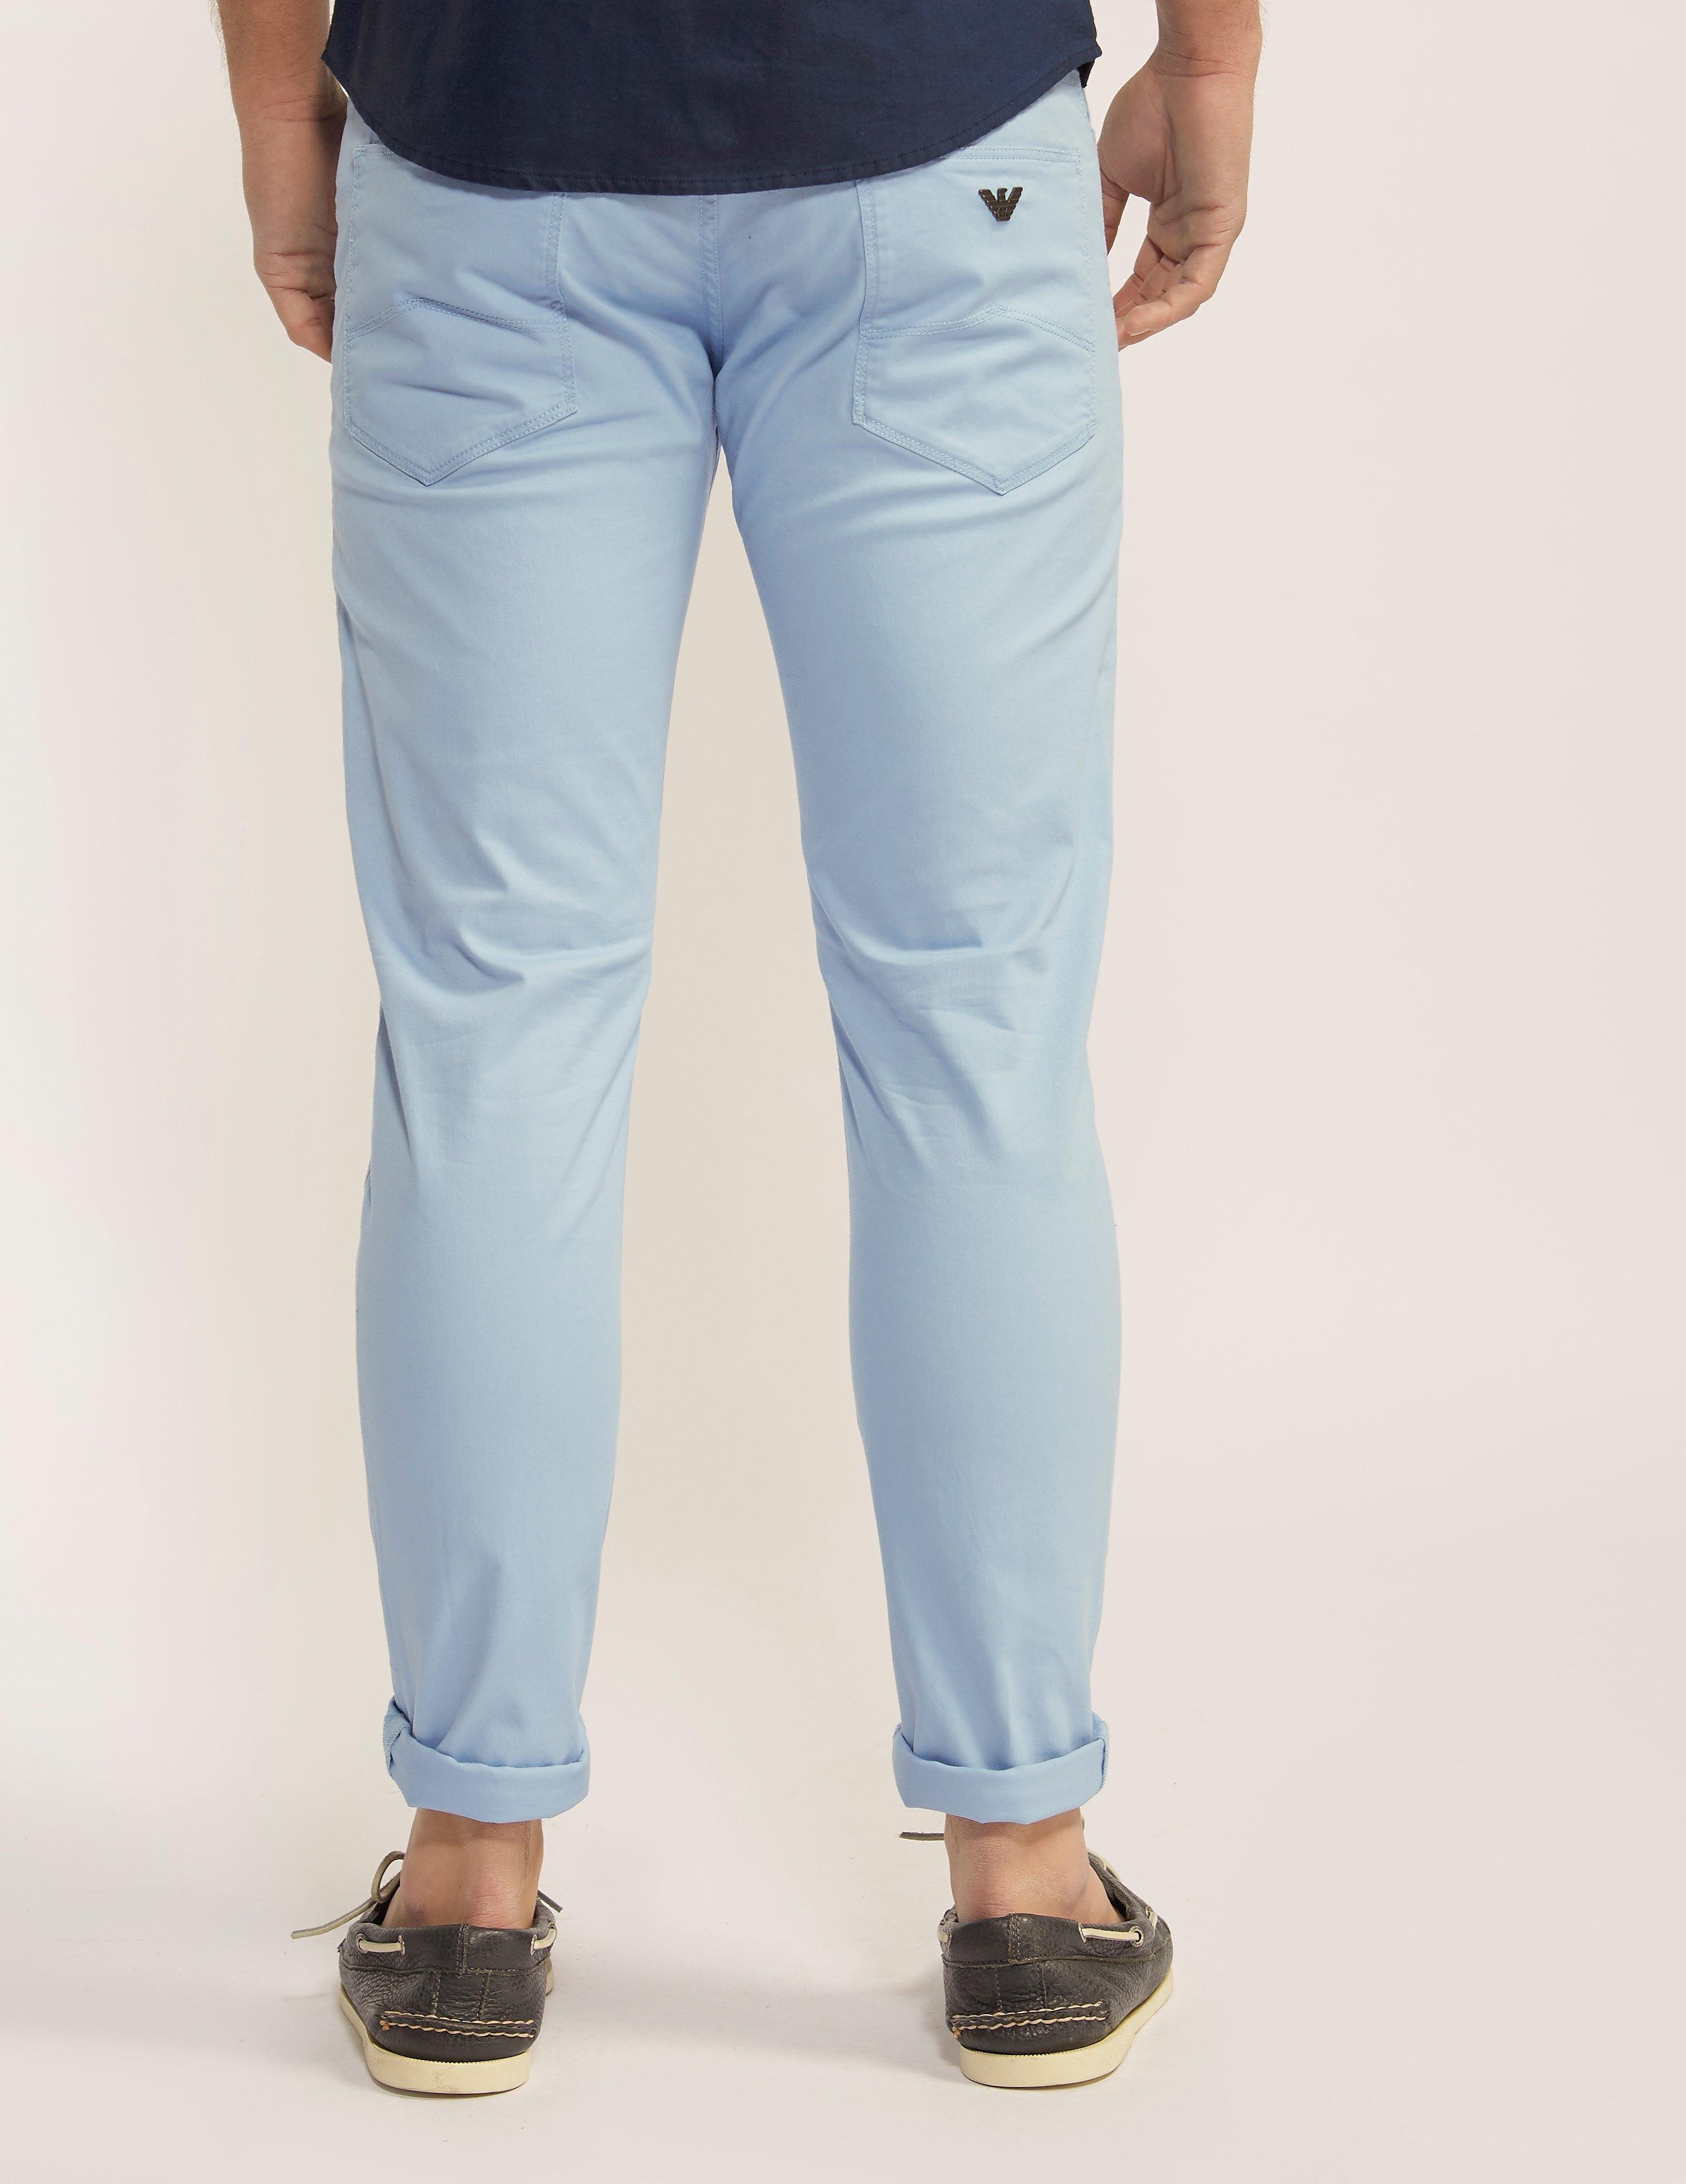 Armani Jeans J06 Cotton Chino  Regular Leg